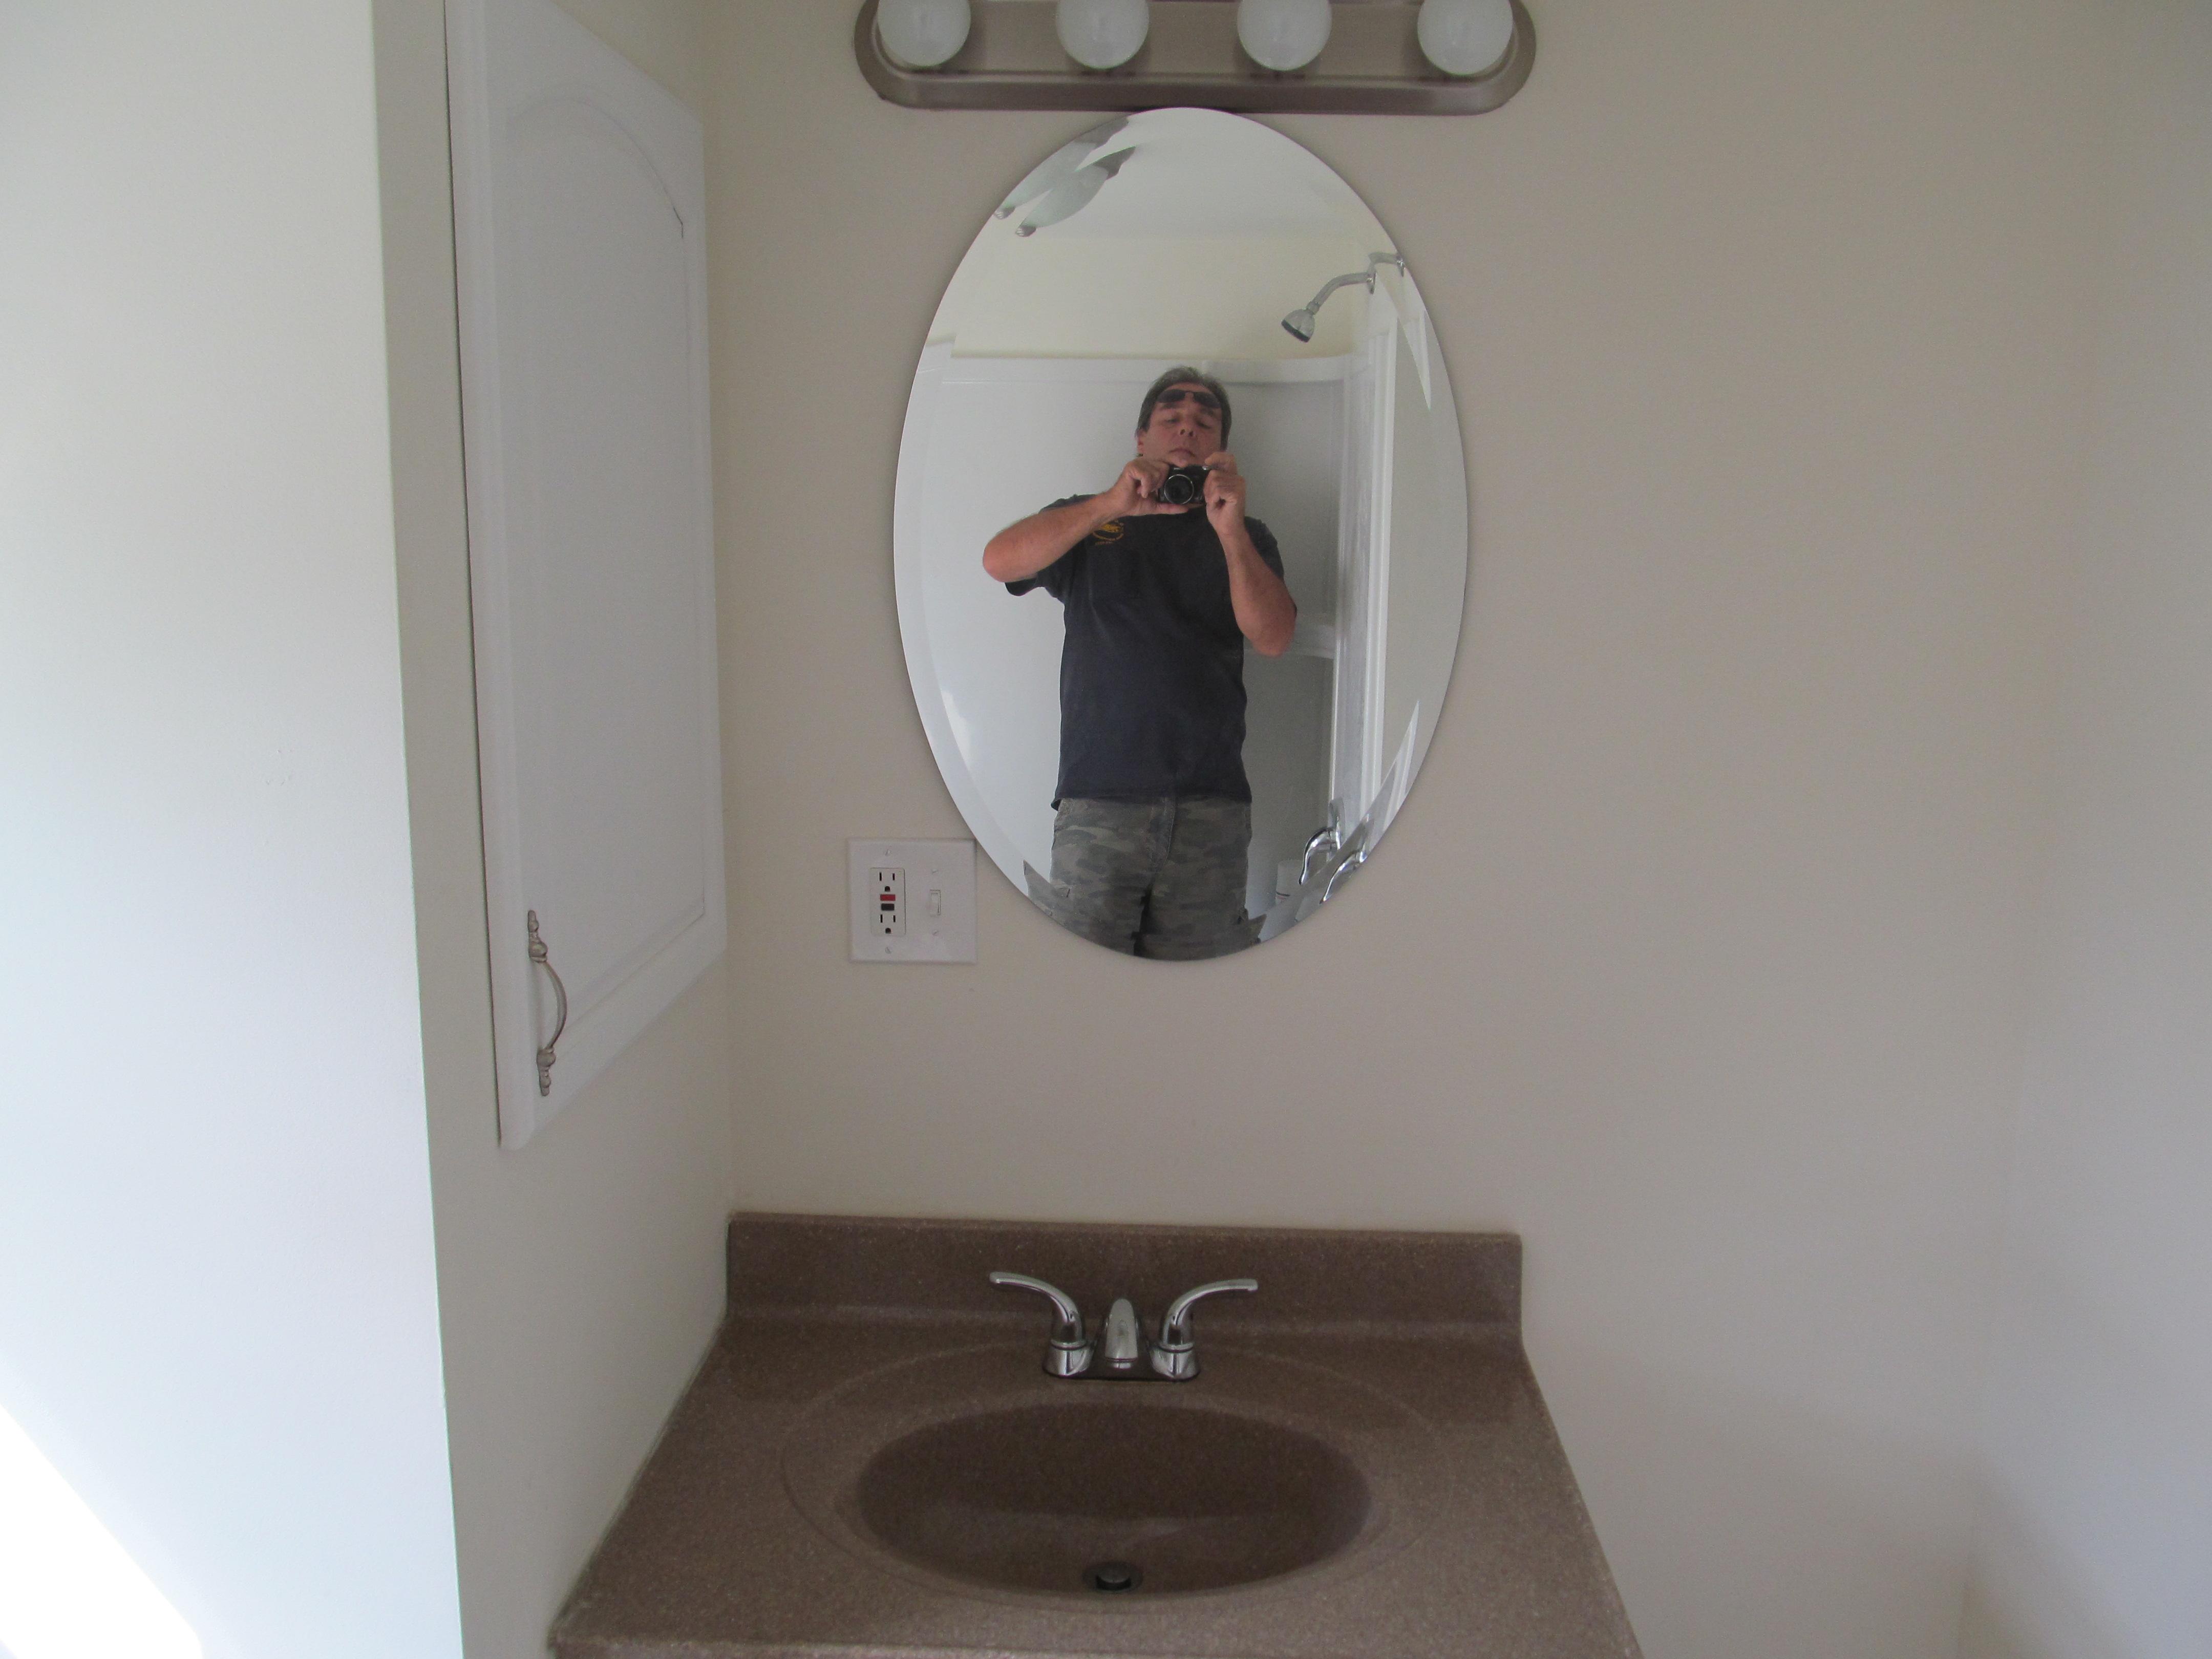 mobile home improvement bathroom sink